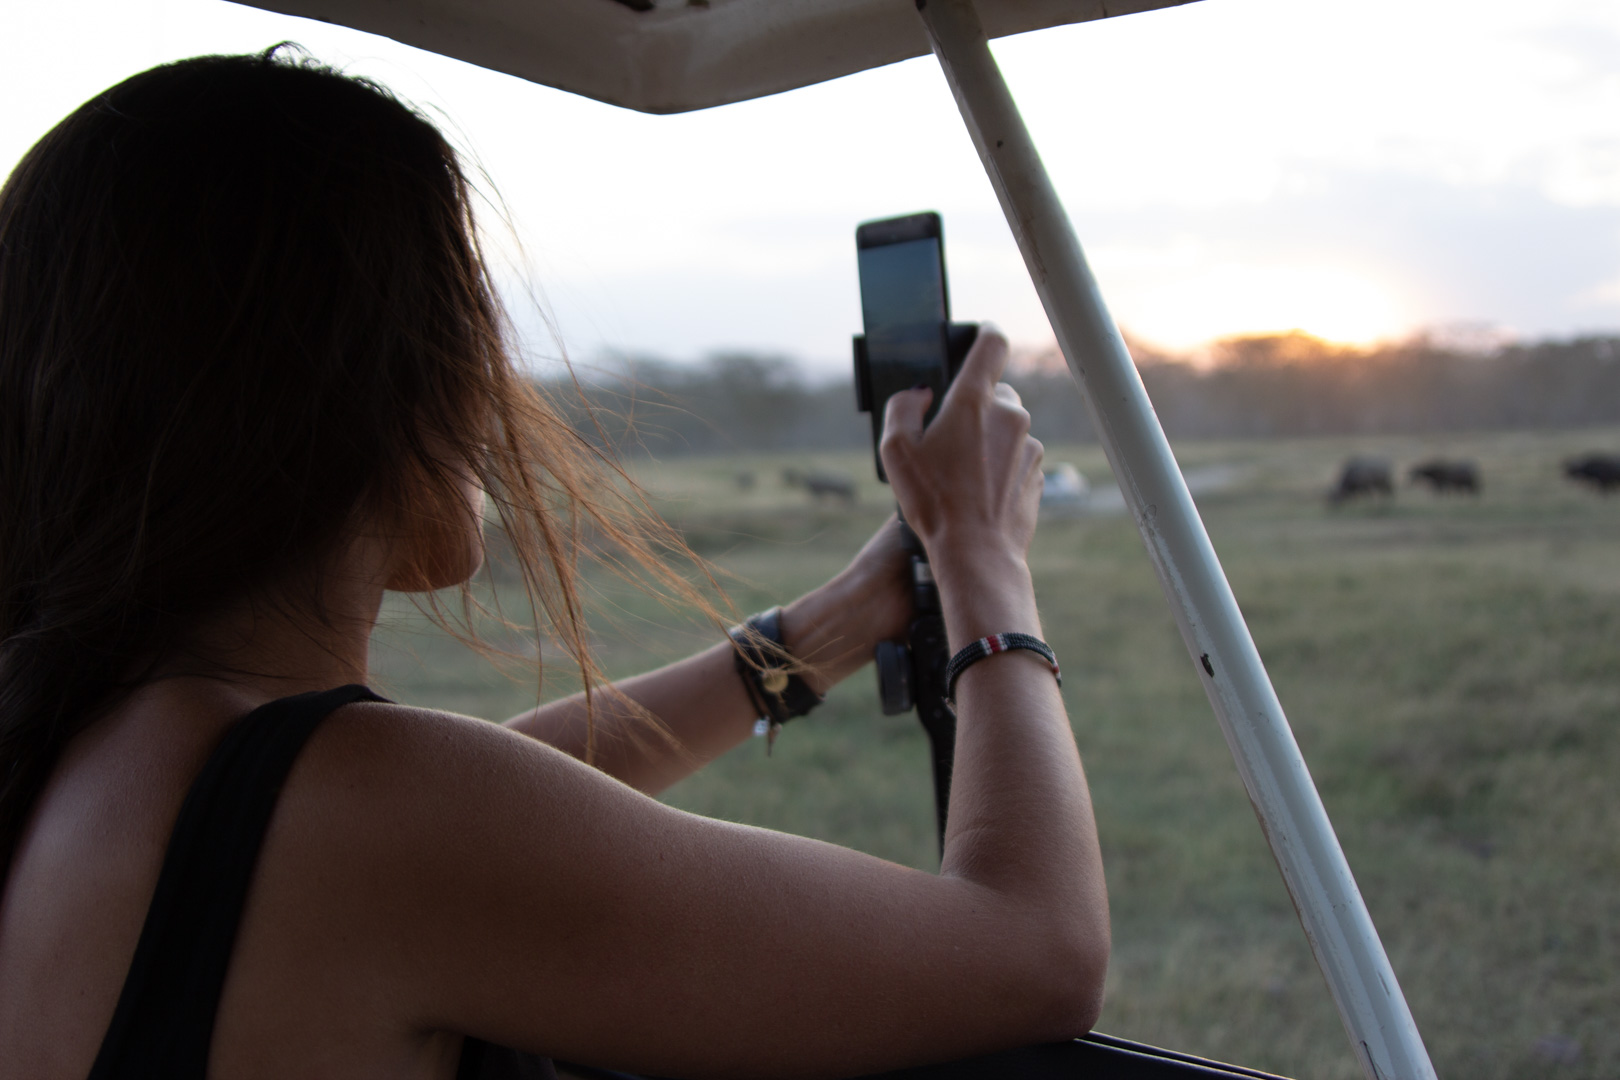 Capturando el atardecer en Lago Nakuru, Kenia